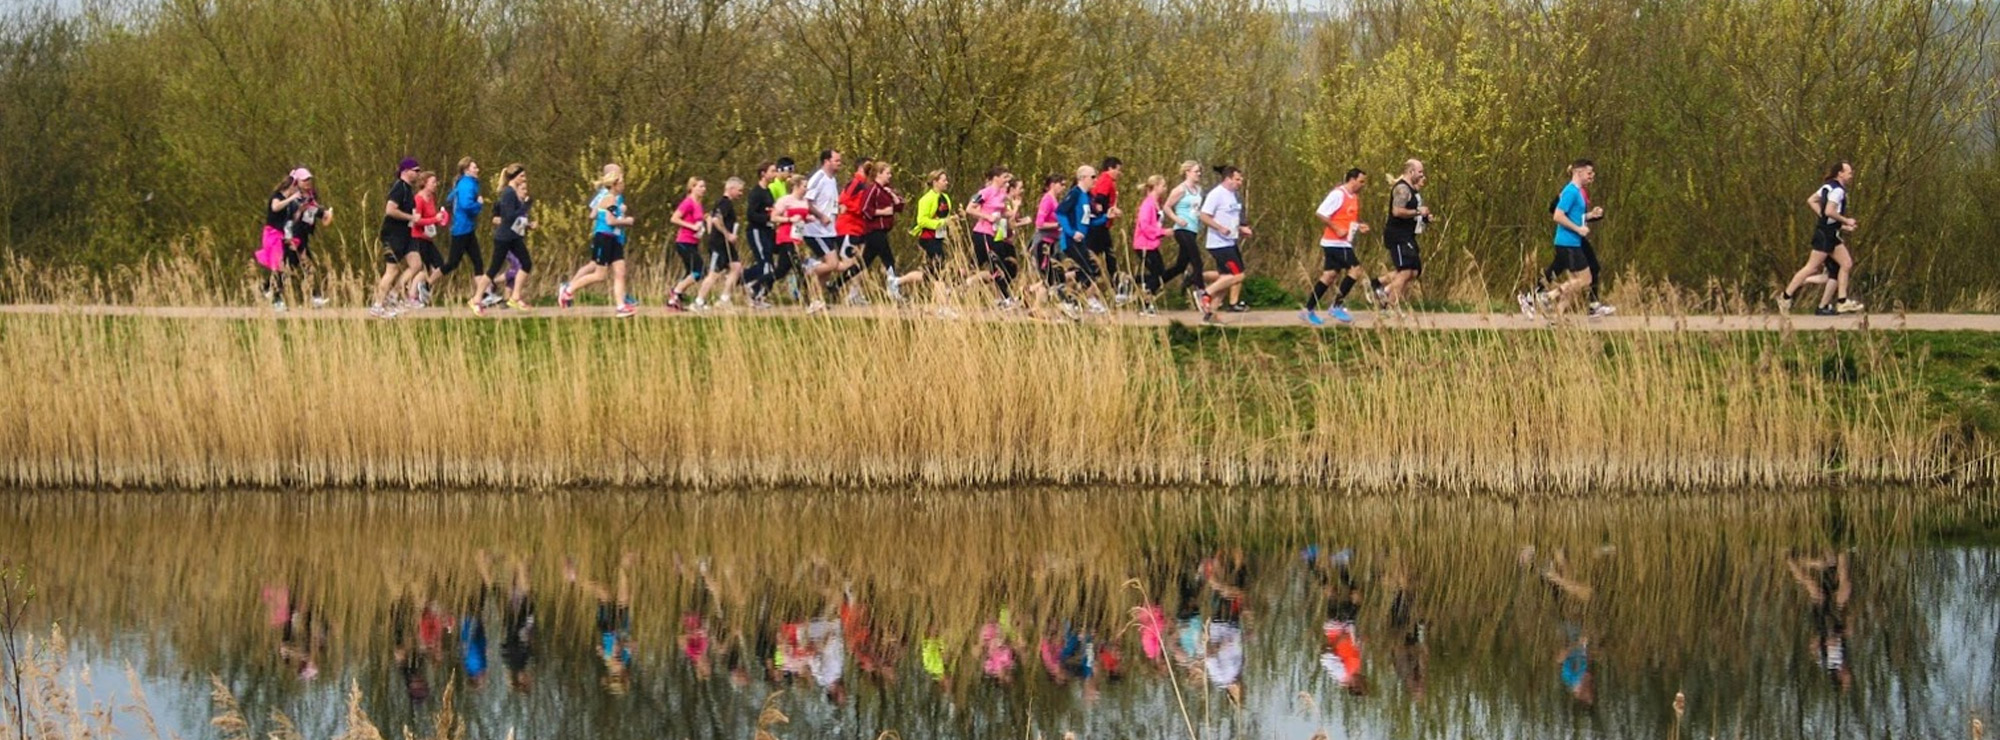 Stanwick Lakes, Northamptonshire - hosts a half-marathon on September 15